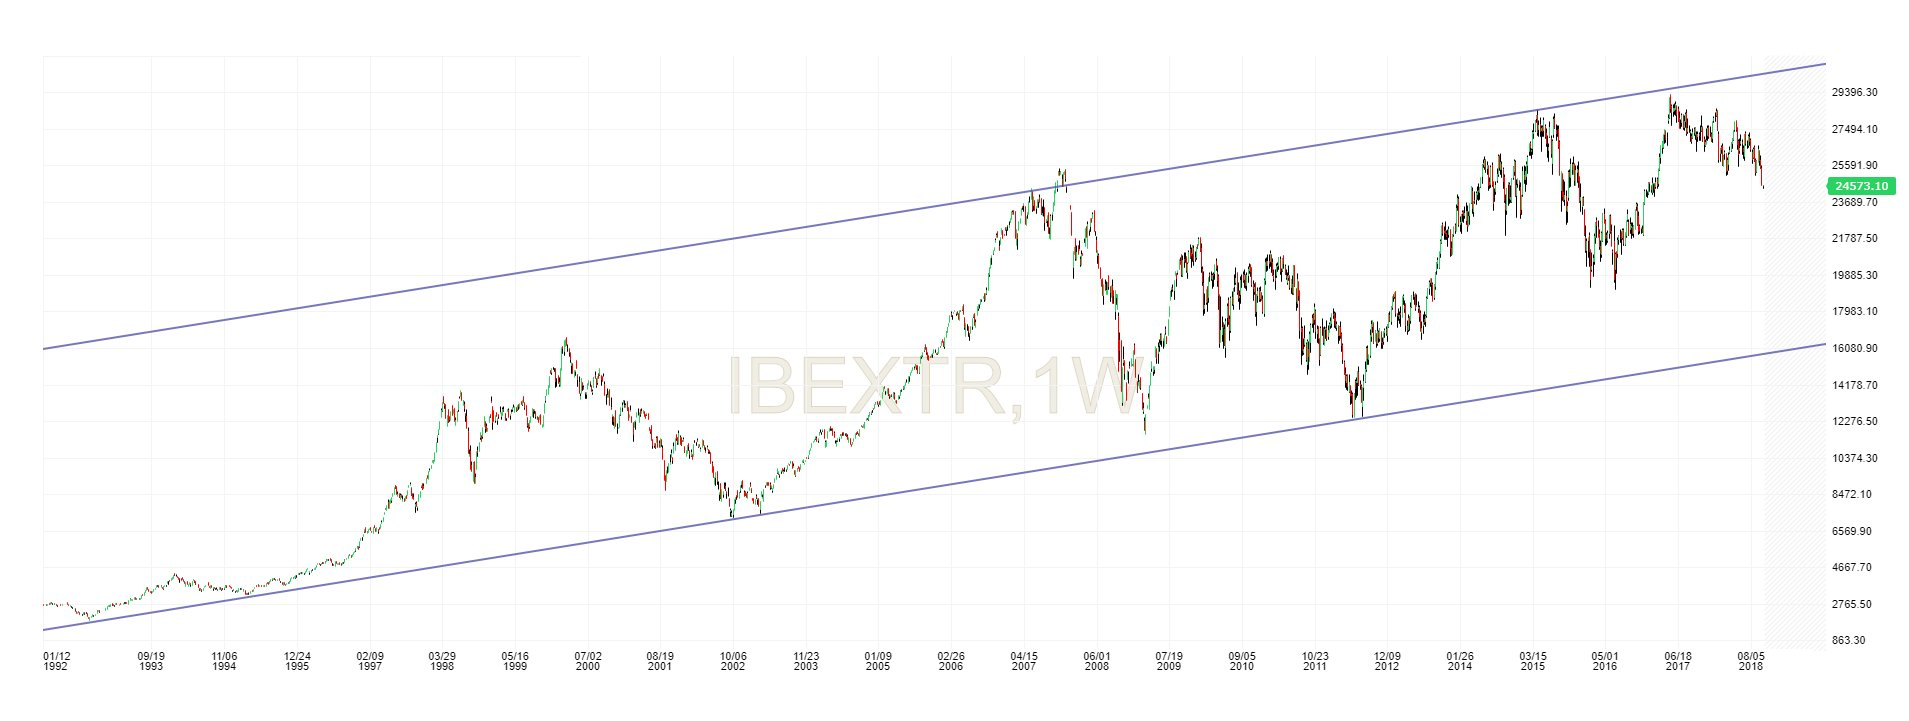 GRAFICOS IBEX - Página 23 Dpip_bNW4AAB1gg